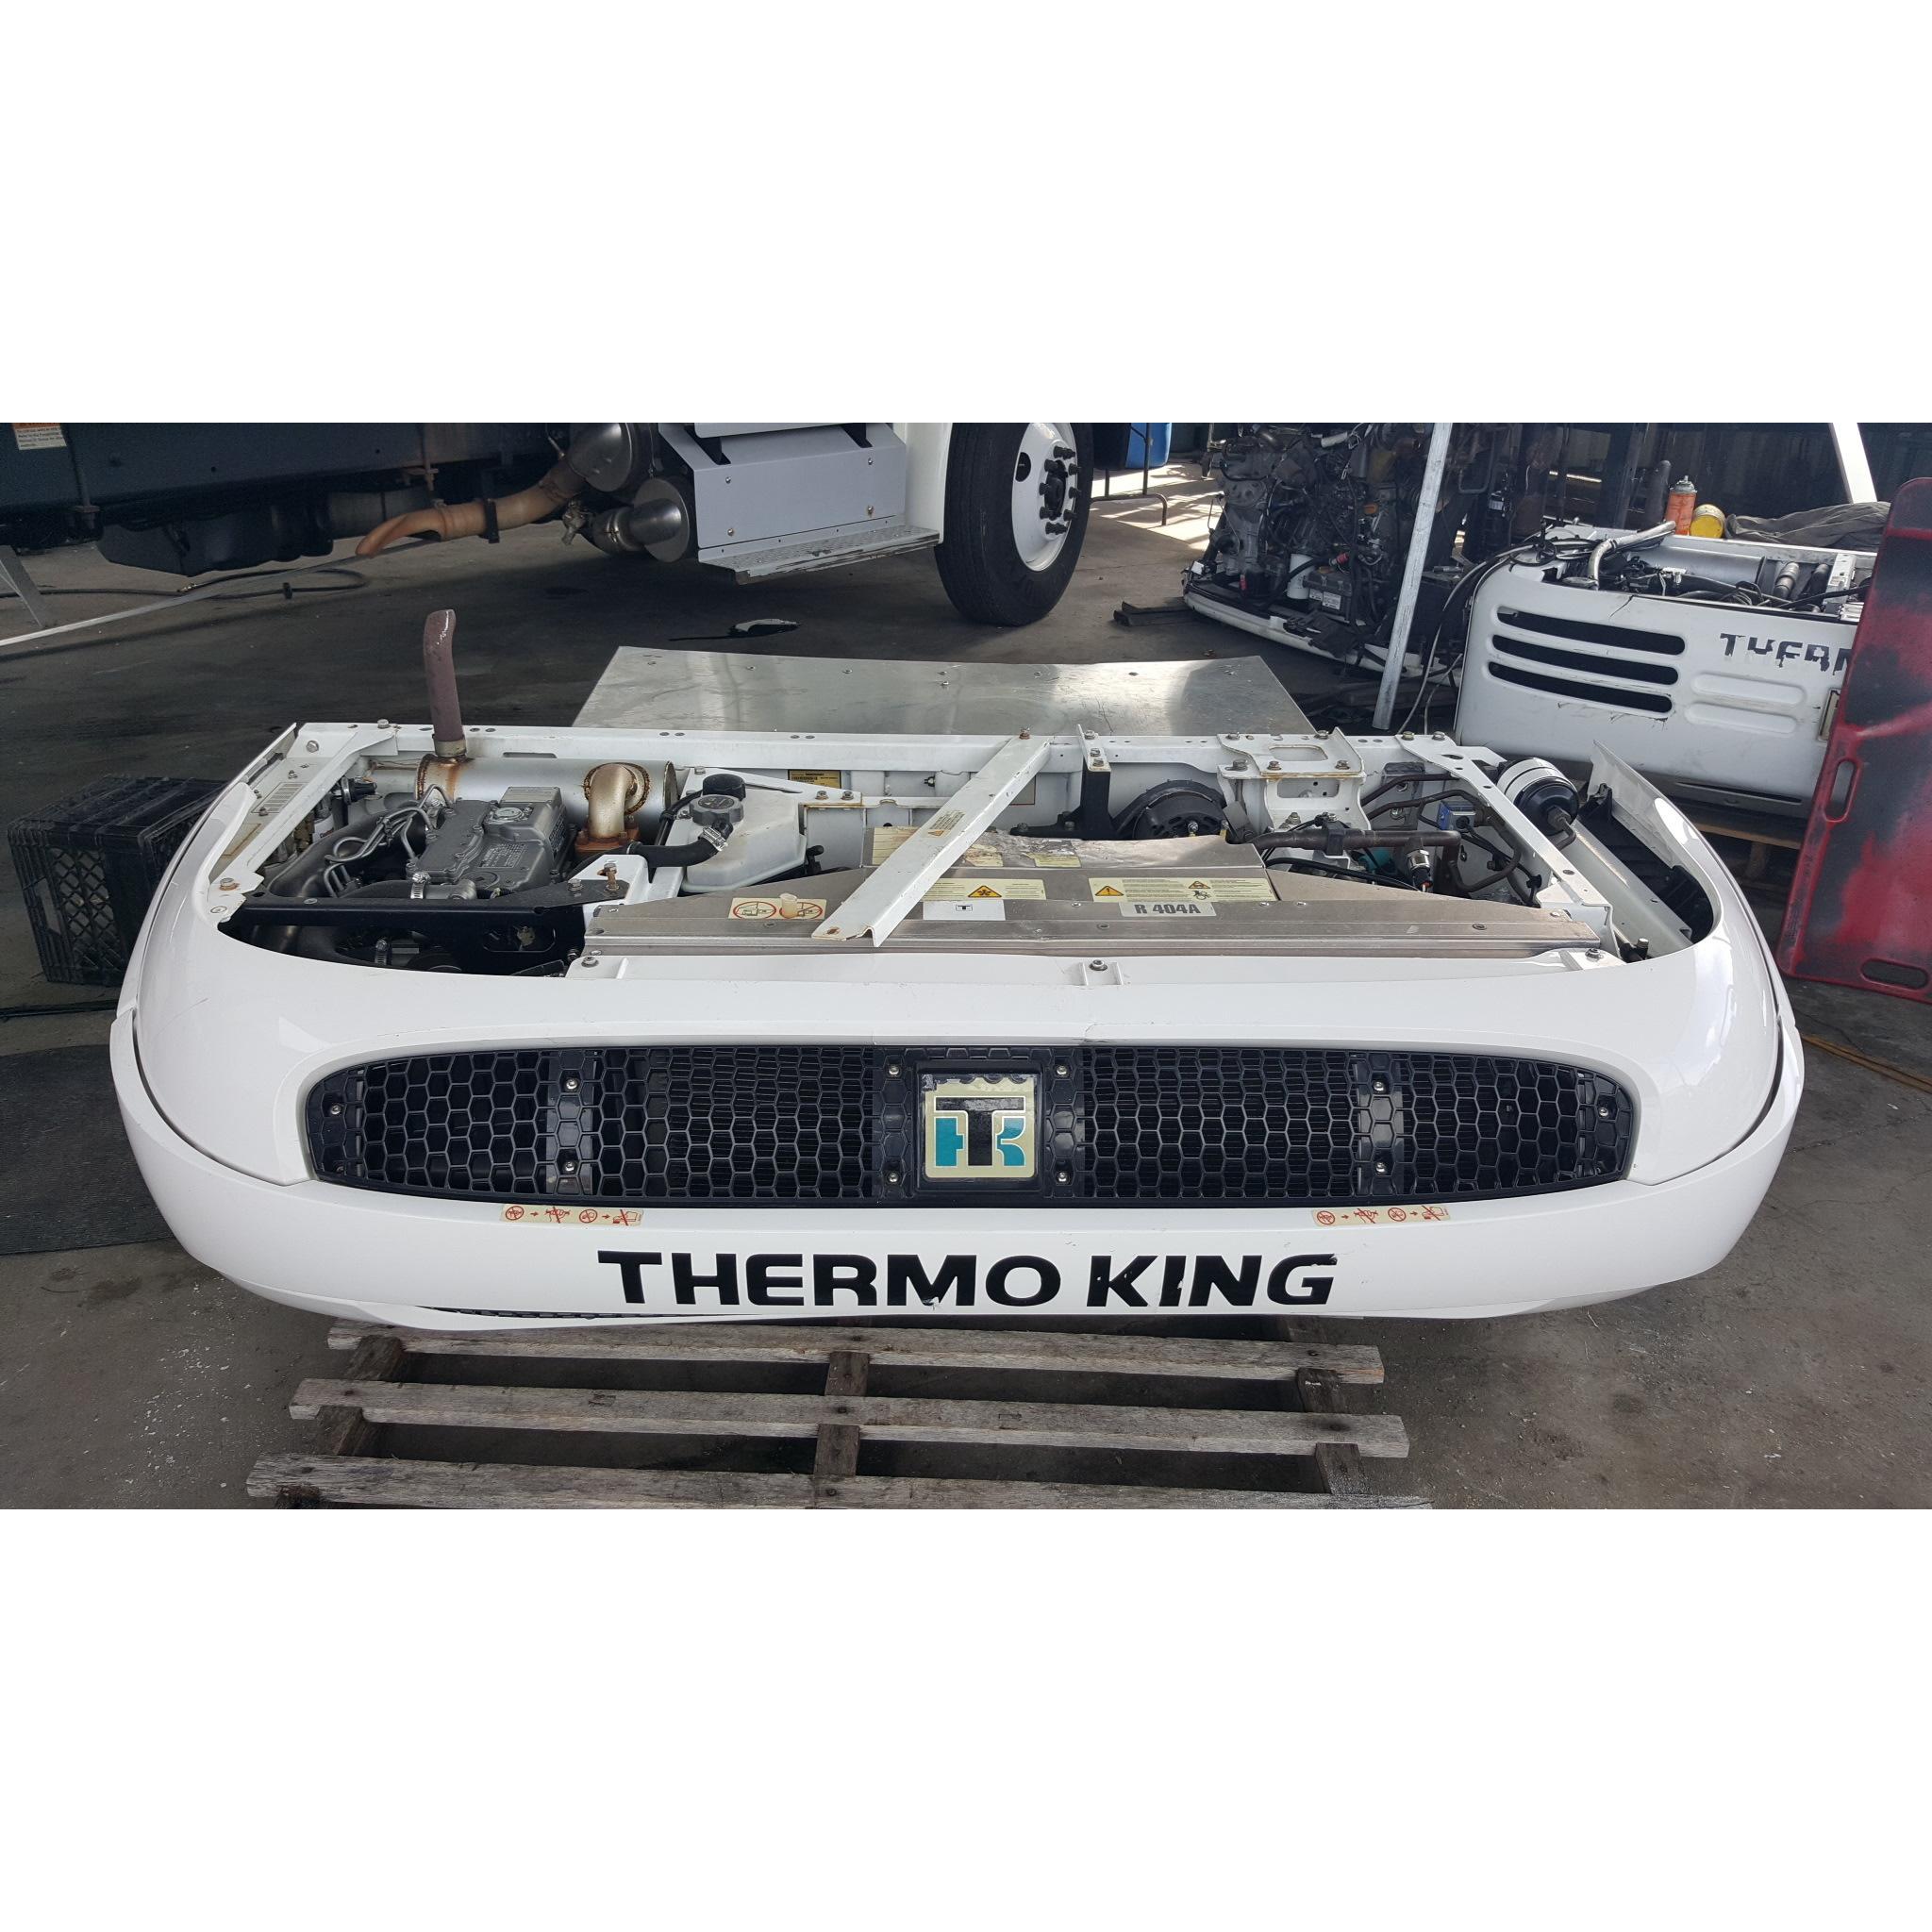 Max Thermo Units